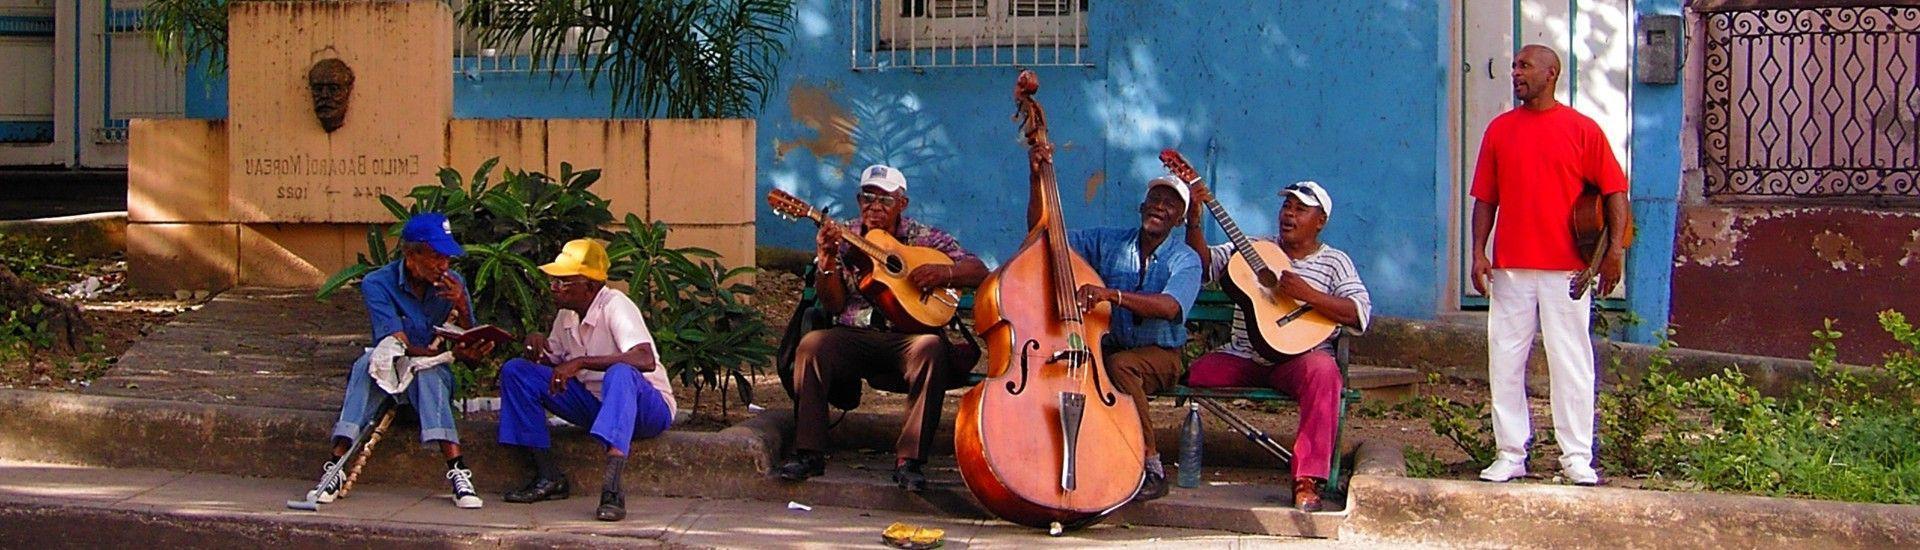 Cuba Libre! ...rum, cygara, salsa i krokodyle